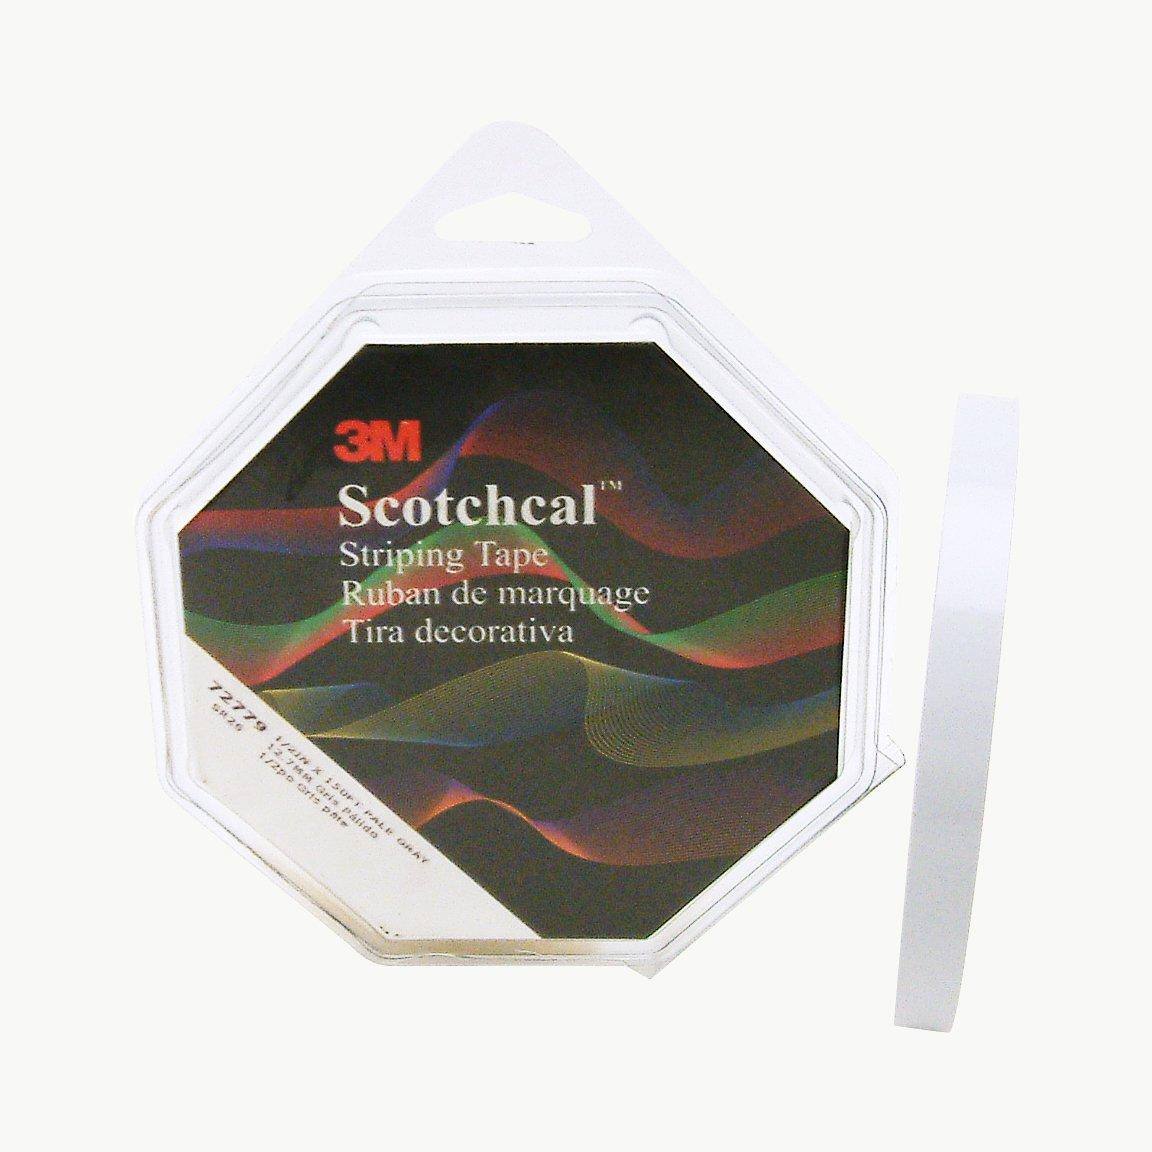 3/m Scotch Scotchcal Striping Tape 70206